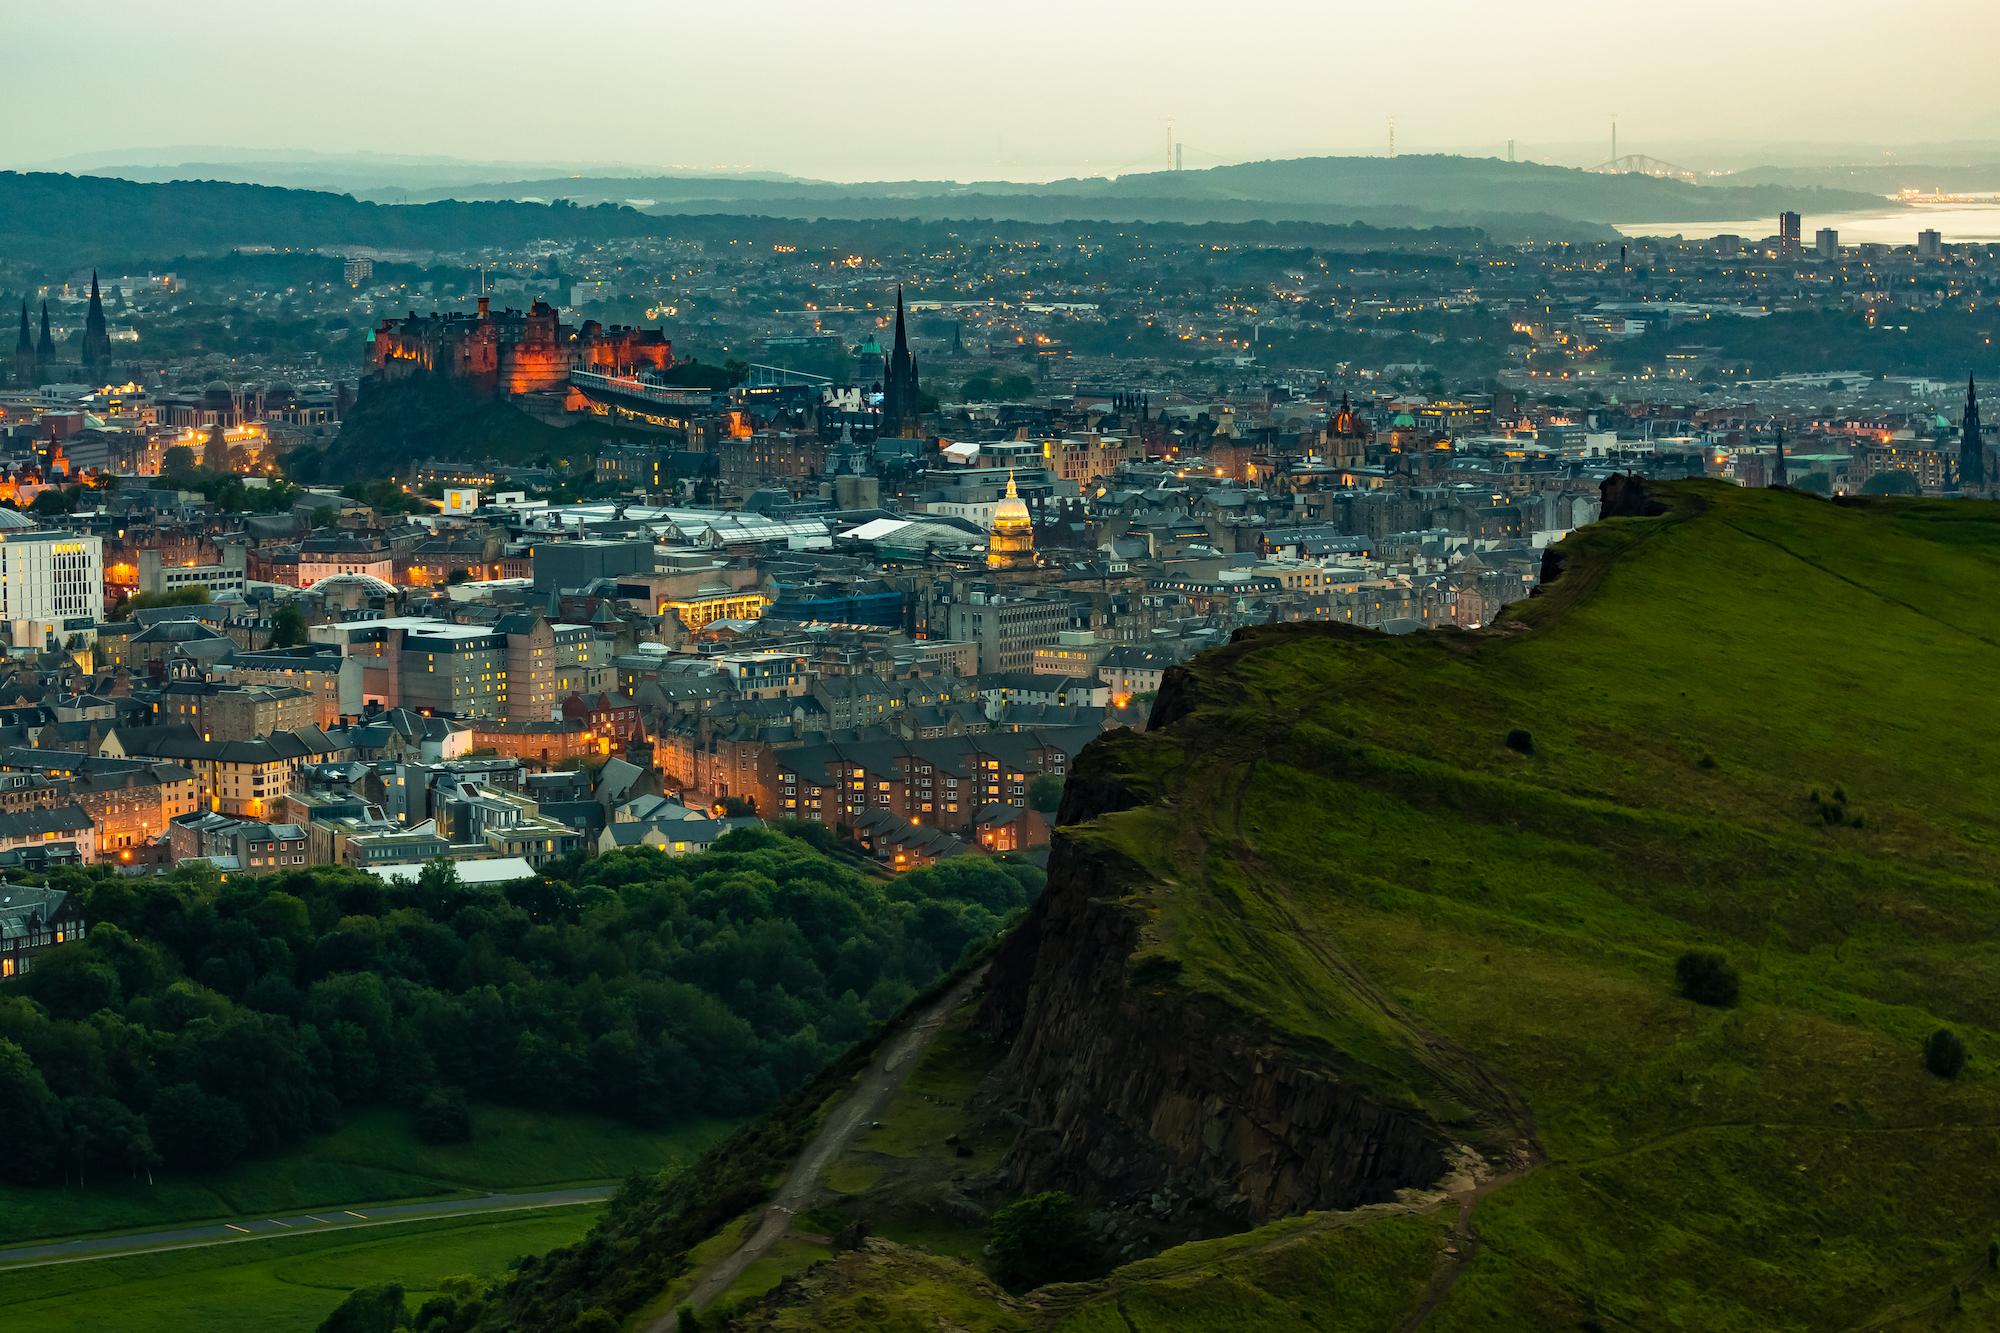 (182) (PO) Salisbury Crags to Edinburgh Castle and the Forth Bridges, Edinburgh, Scotland.jpg